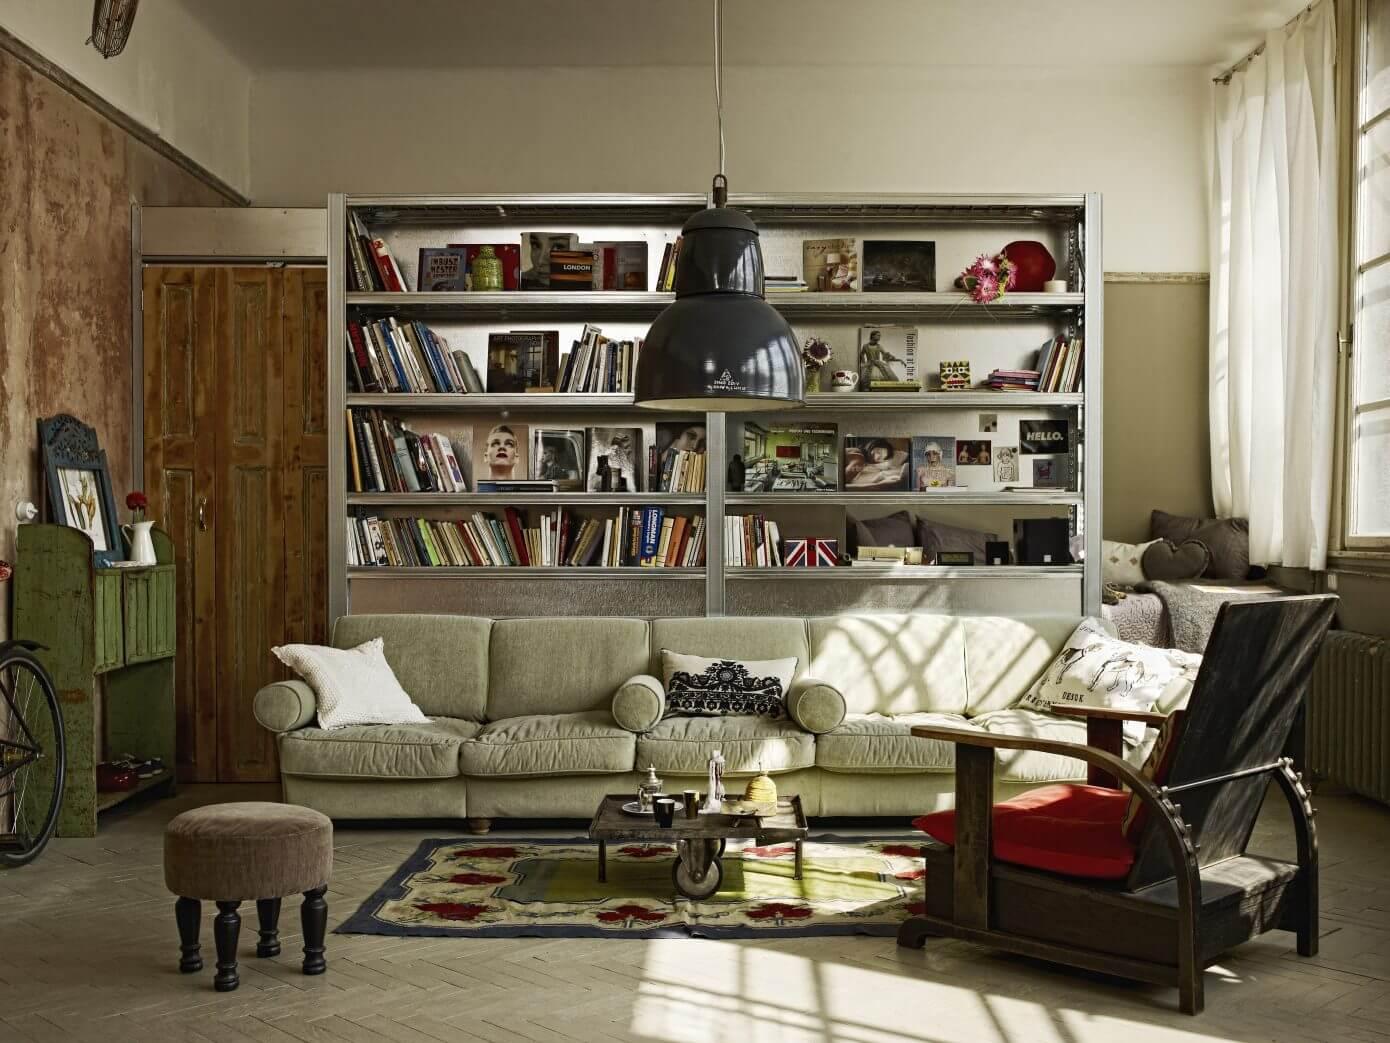 Miniloft in Budapest by A+Z Design Studio